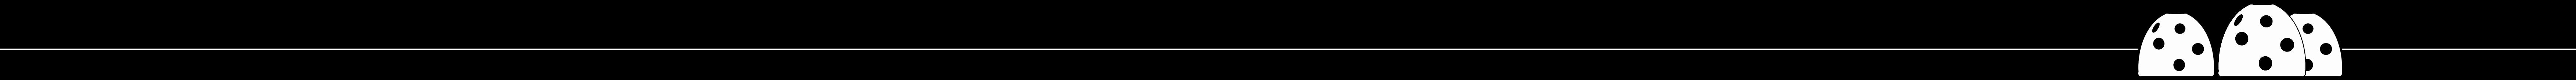 RBF_Divider-B-W2_Long